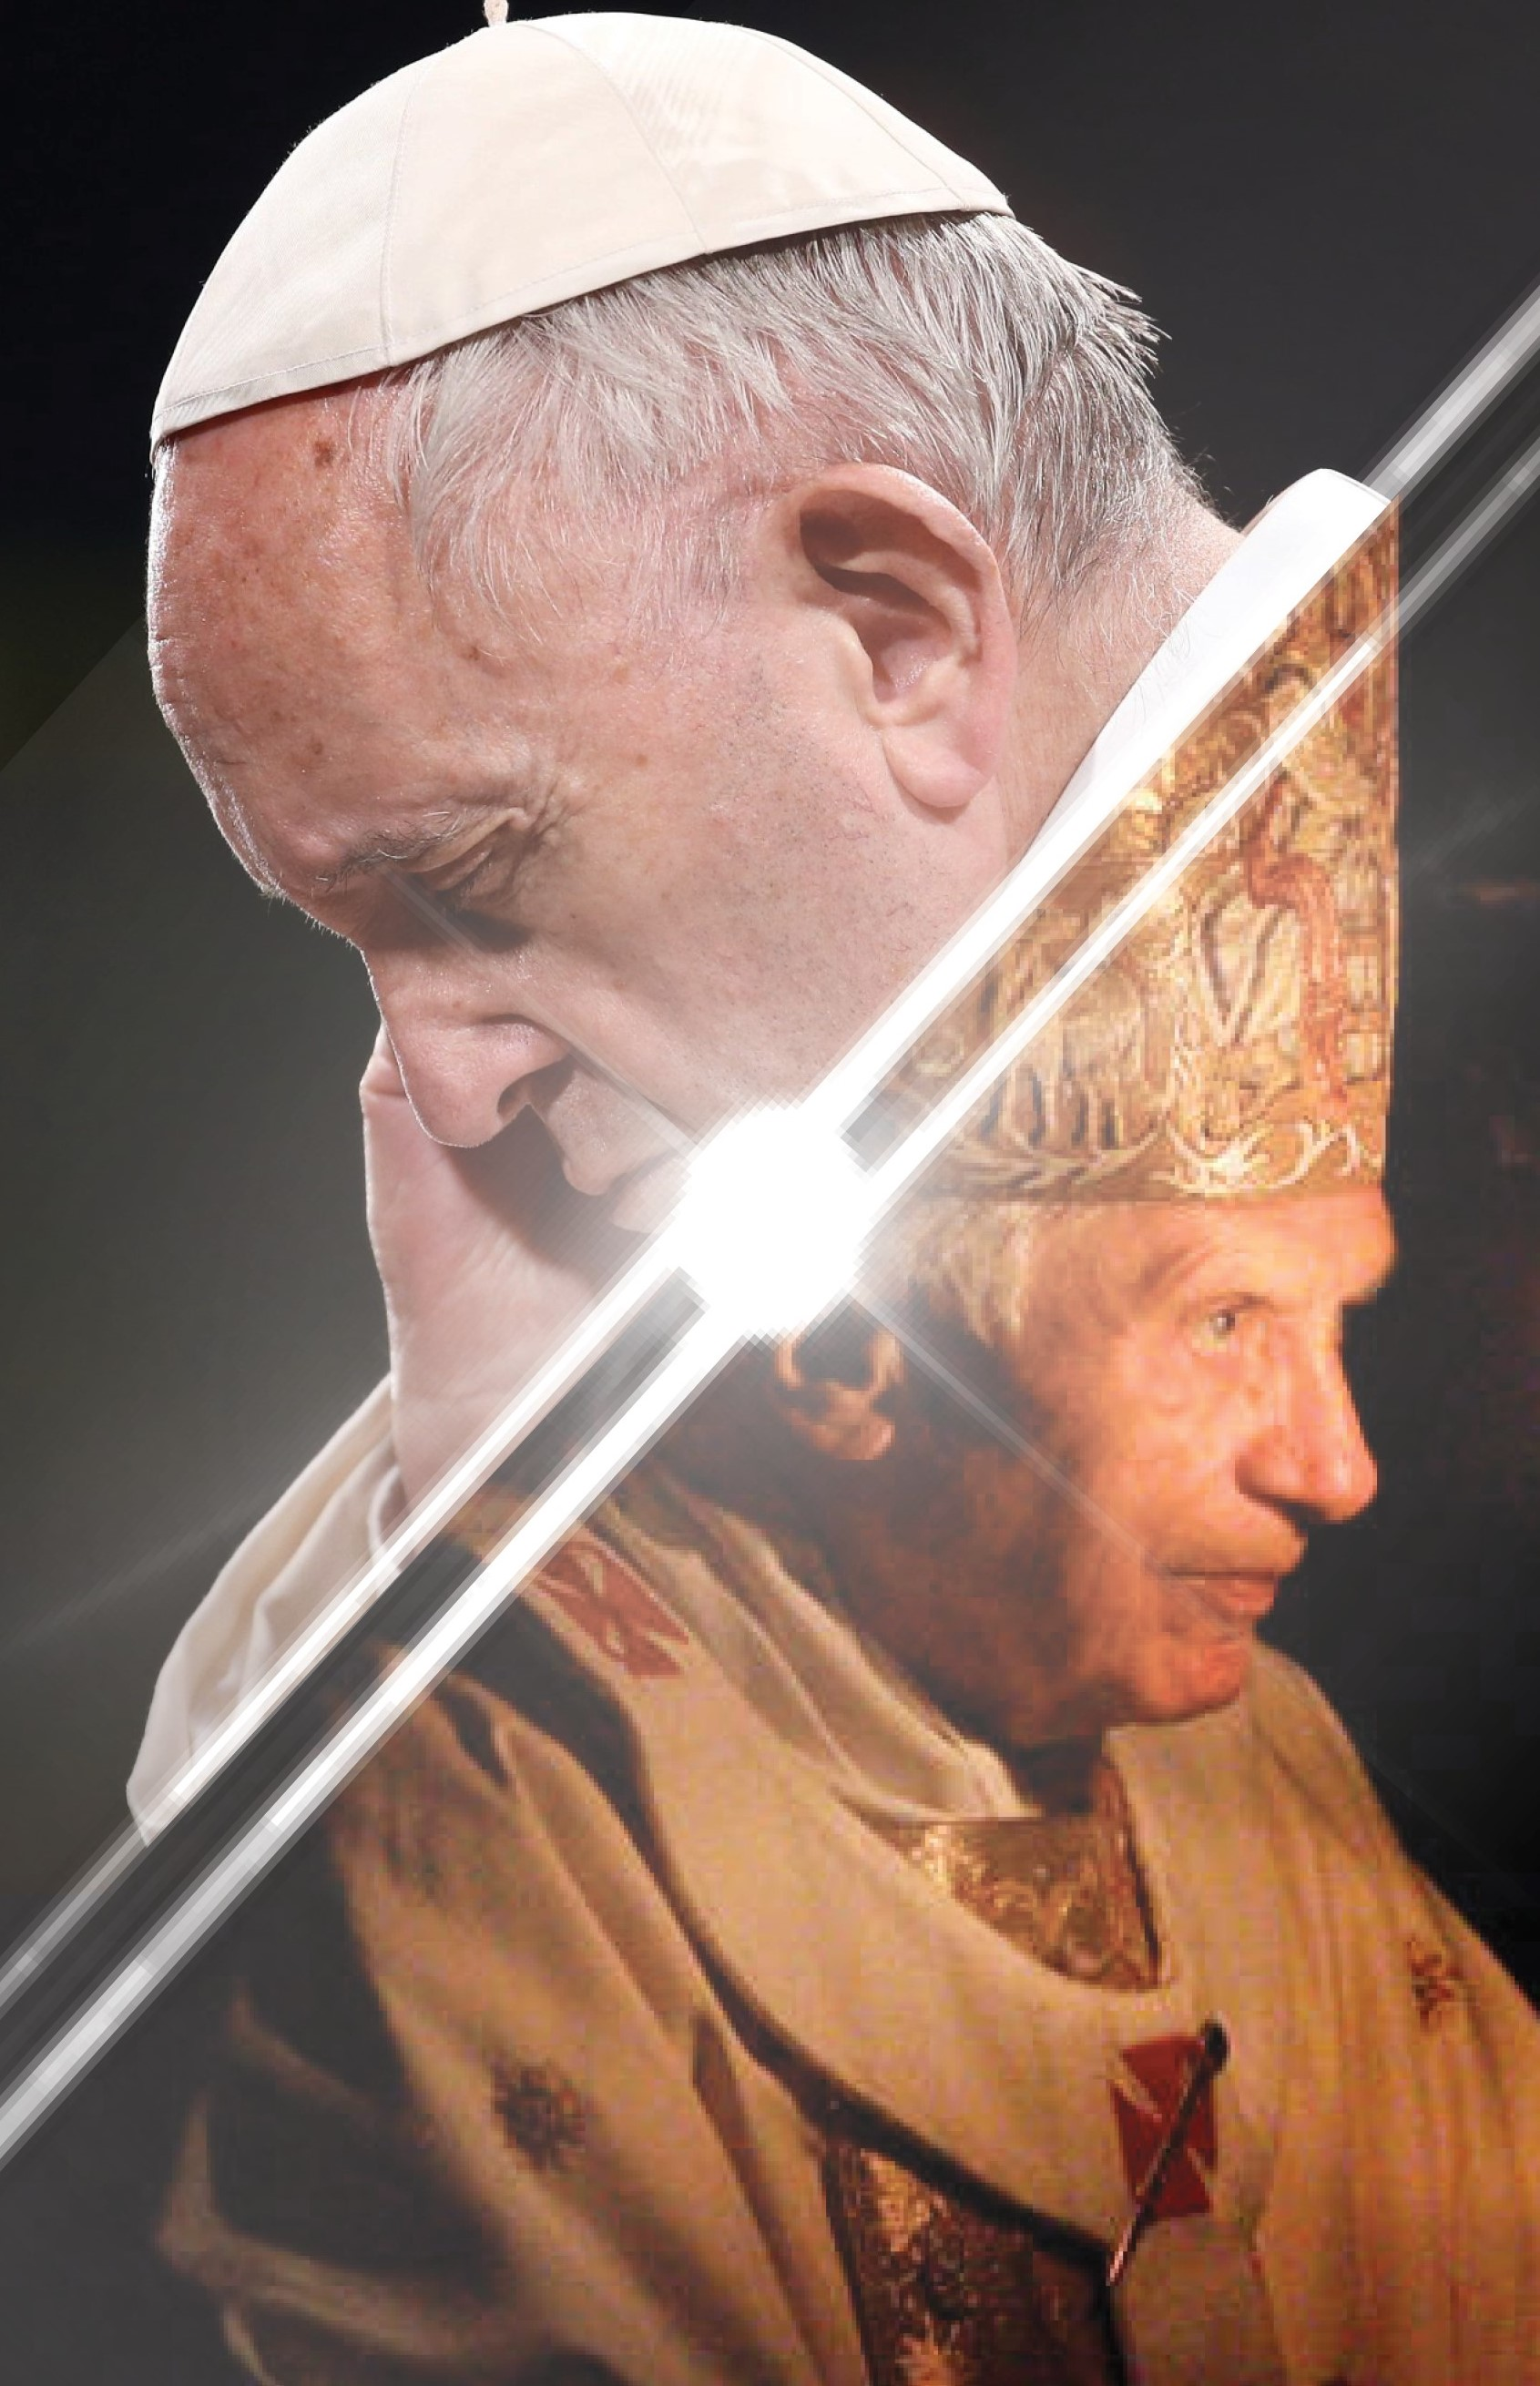 twp popes